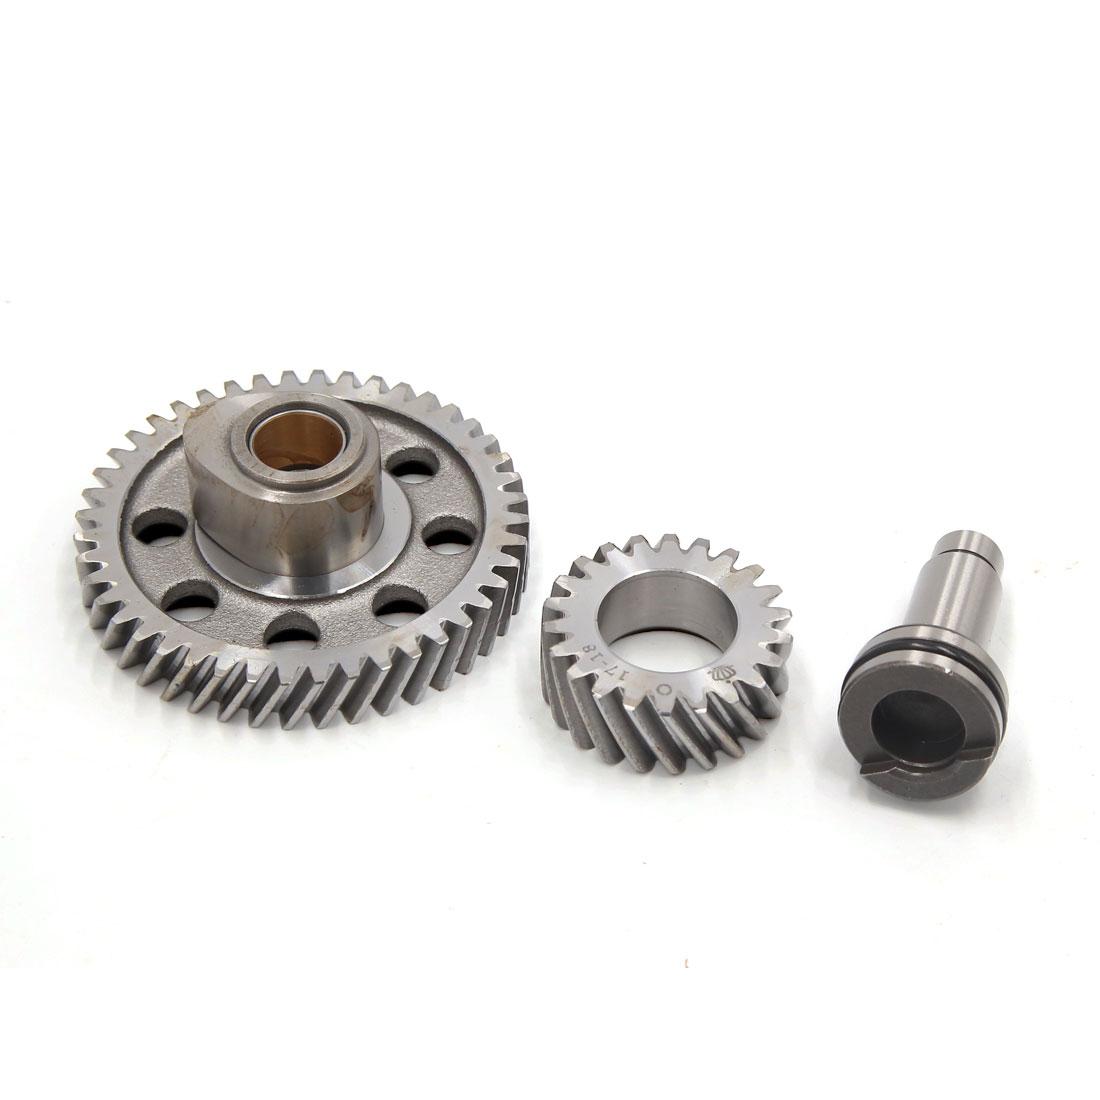 Metal Motorcycle Engine Motor Gear Intake Exhaus Cam Camshaft for CG125